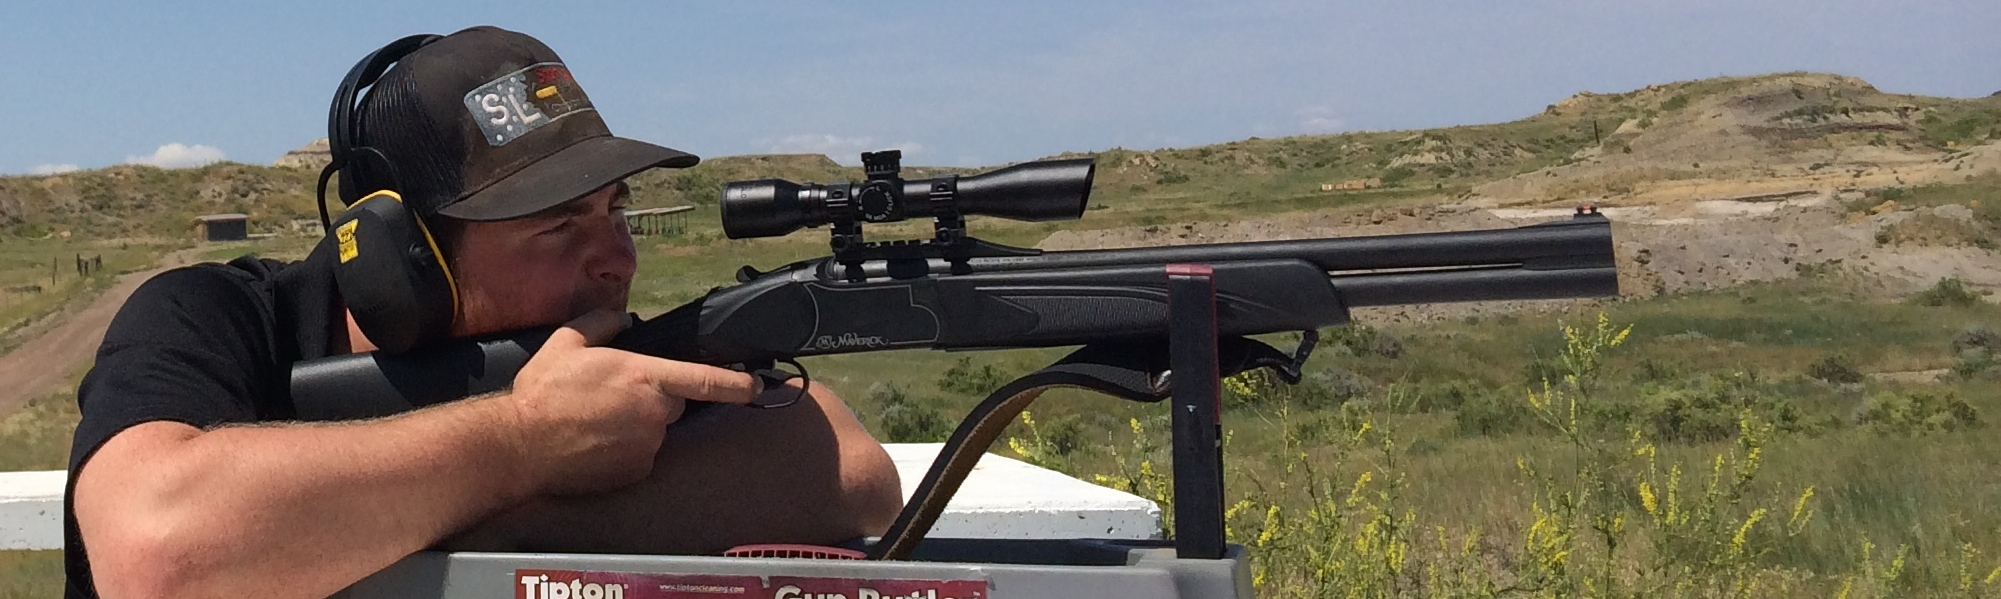 Taking Aim at the Range!